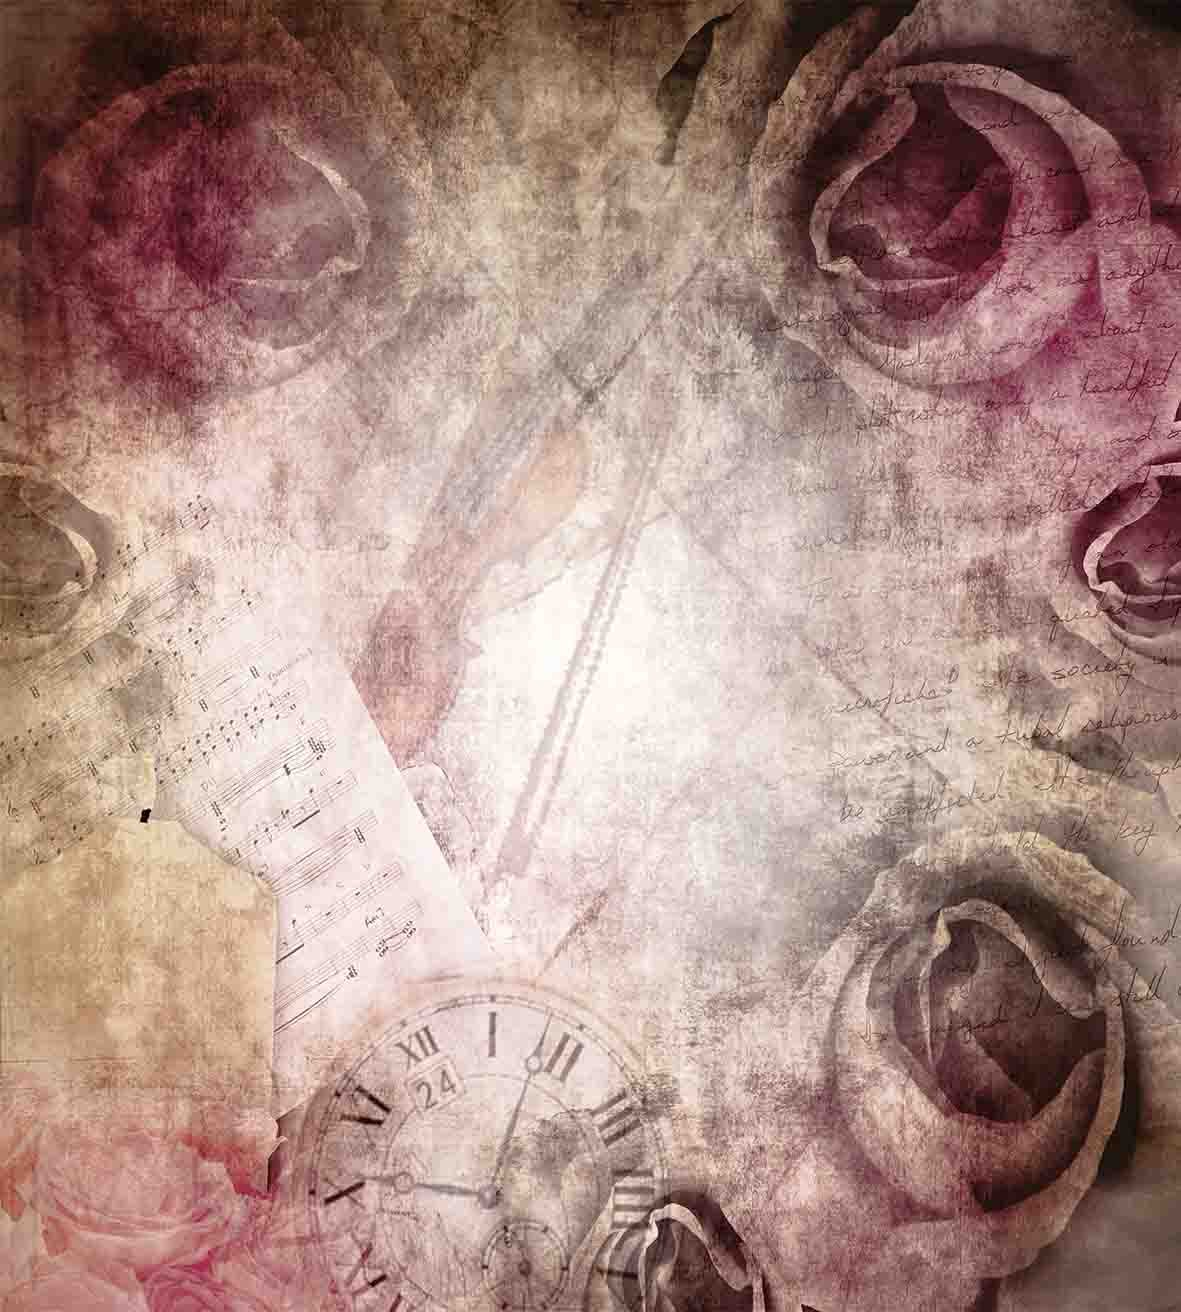 Grunge Style Vintage Inspired Rose Design on Retro Artful Elements Violin Time Music Decorative 3 Piece Bedding Set with 2 Pillow Shams Ambesonne Rose Duvet Cover Set King Size Pink Beige